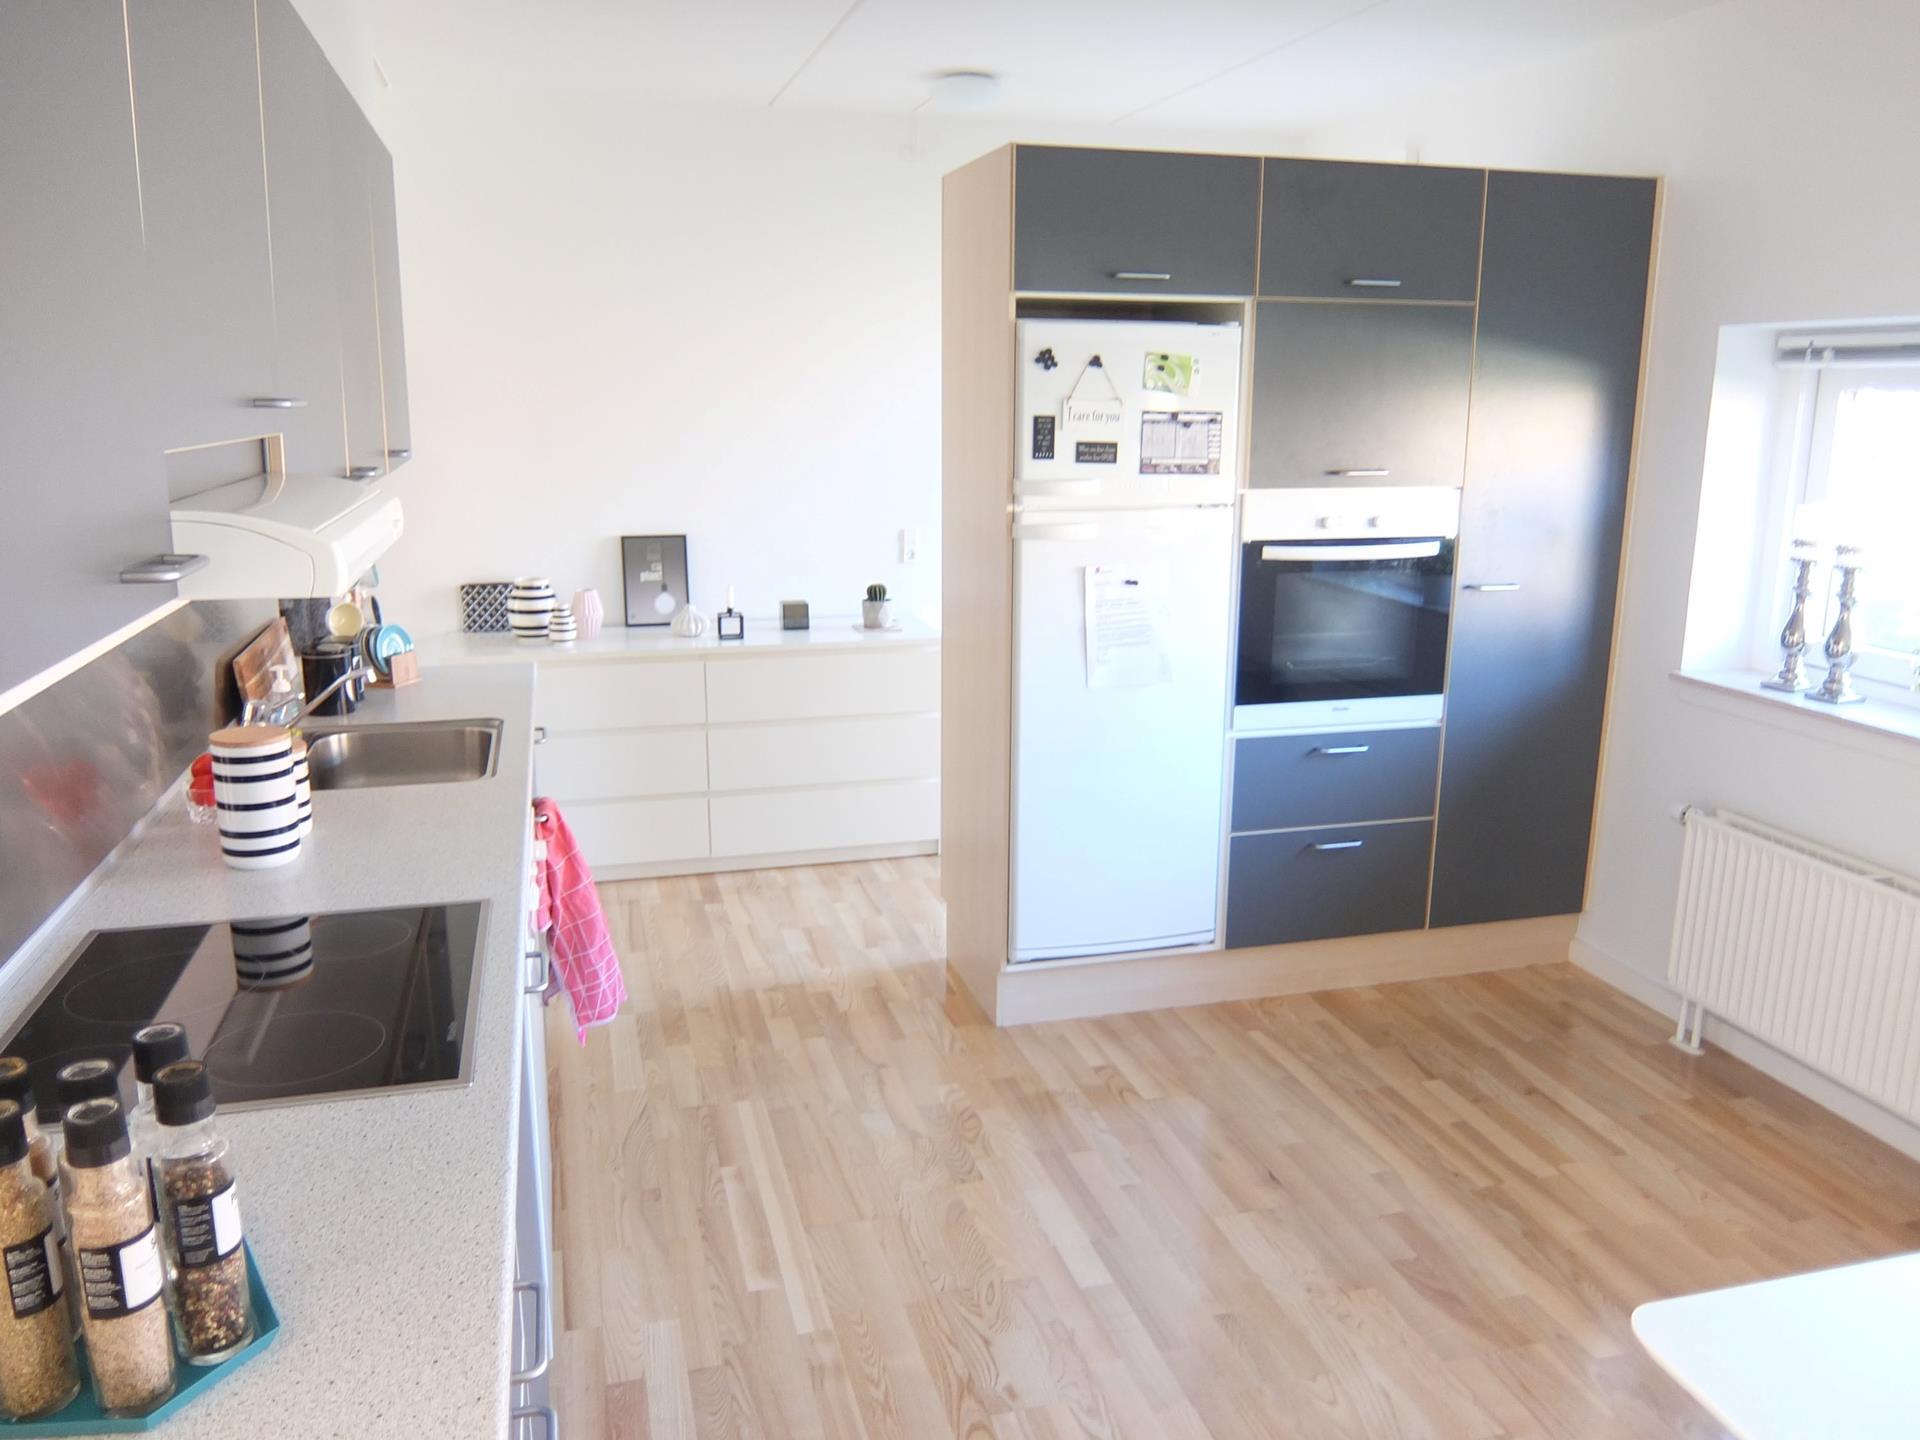 Boligudlejning på Blegkilde Alle i Aalborg - Køkken